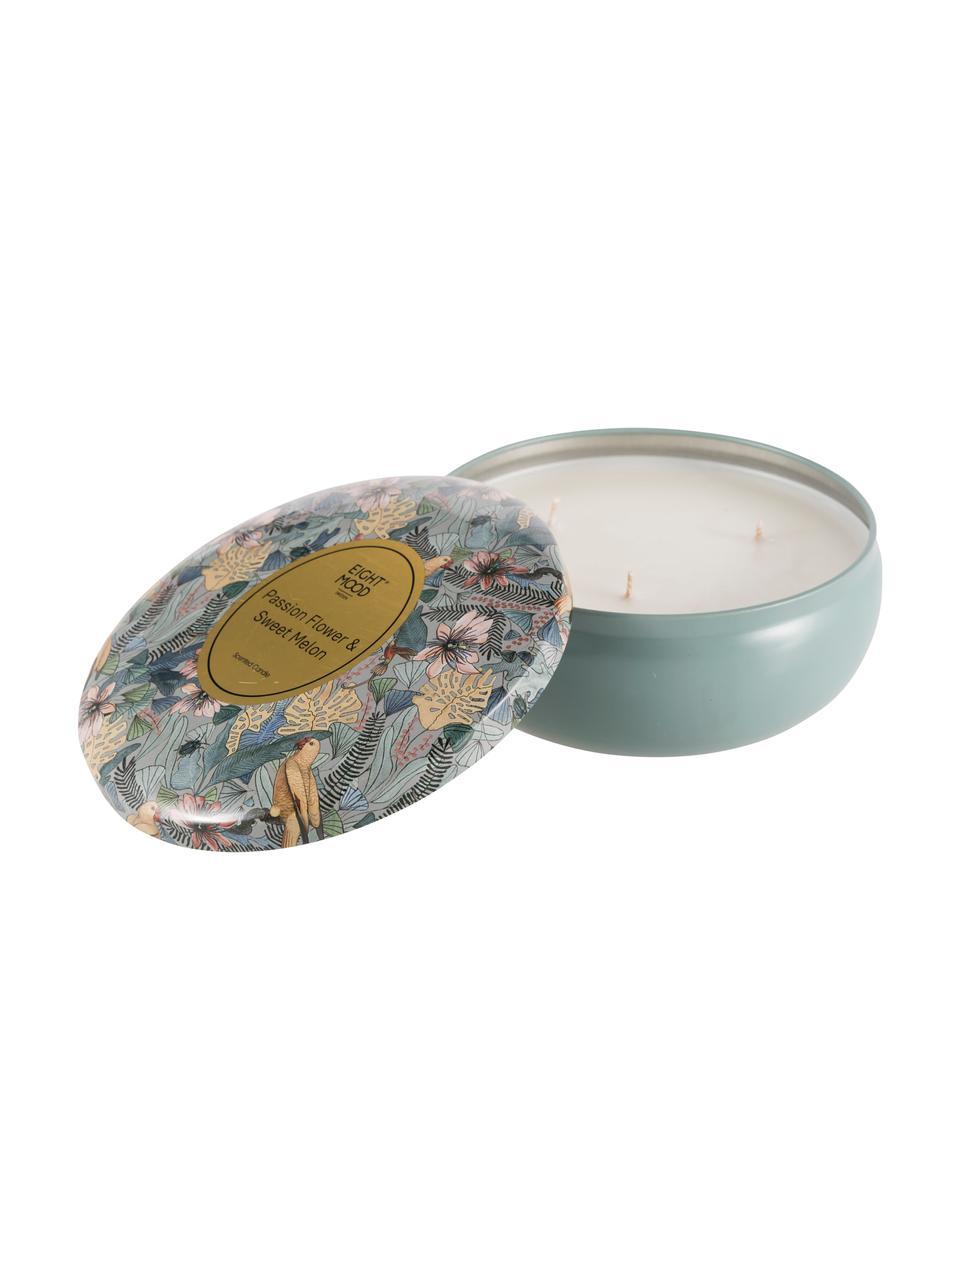 Dreidochtduftkerze Luciana (Zitrone, Orange & Süße Melone), Behälter: Metall, Blau, Mehrfarbig, Ø 8 x H 5 cm